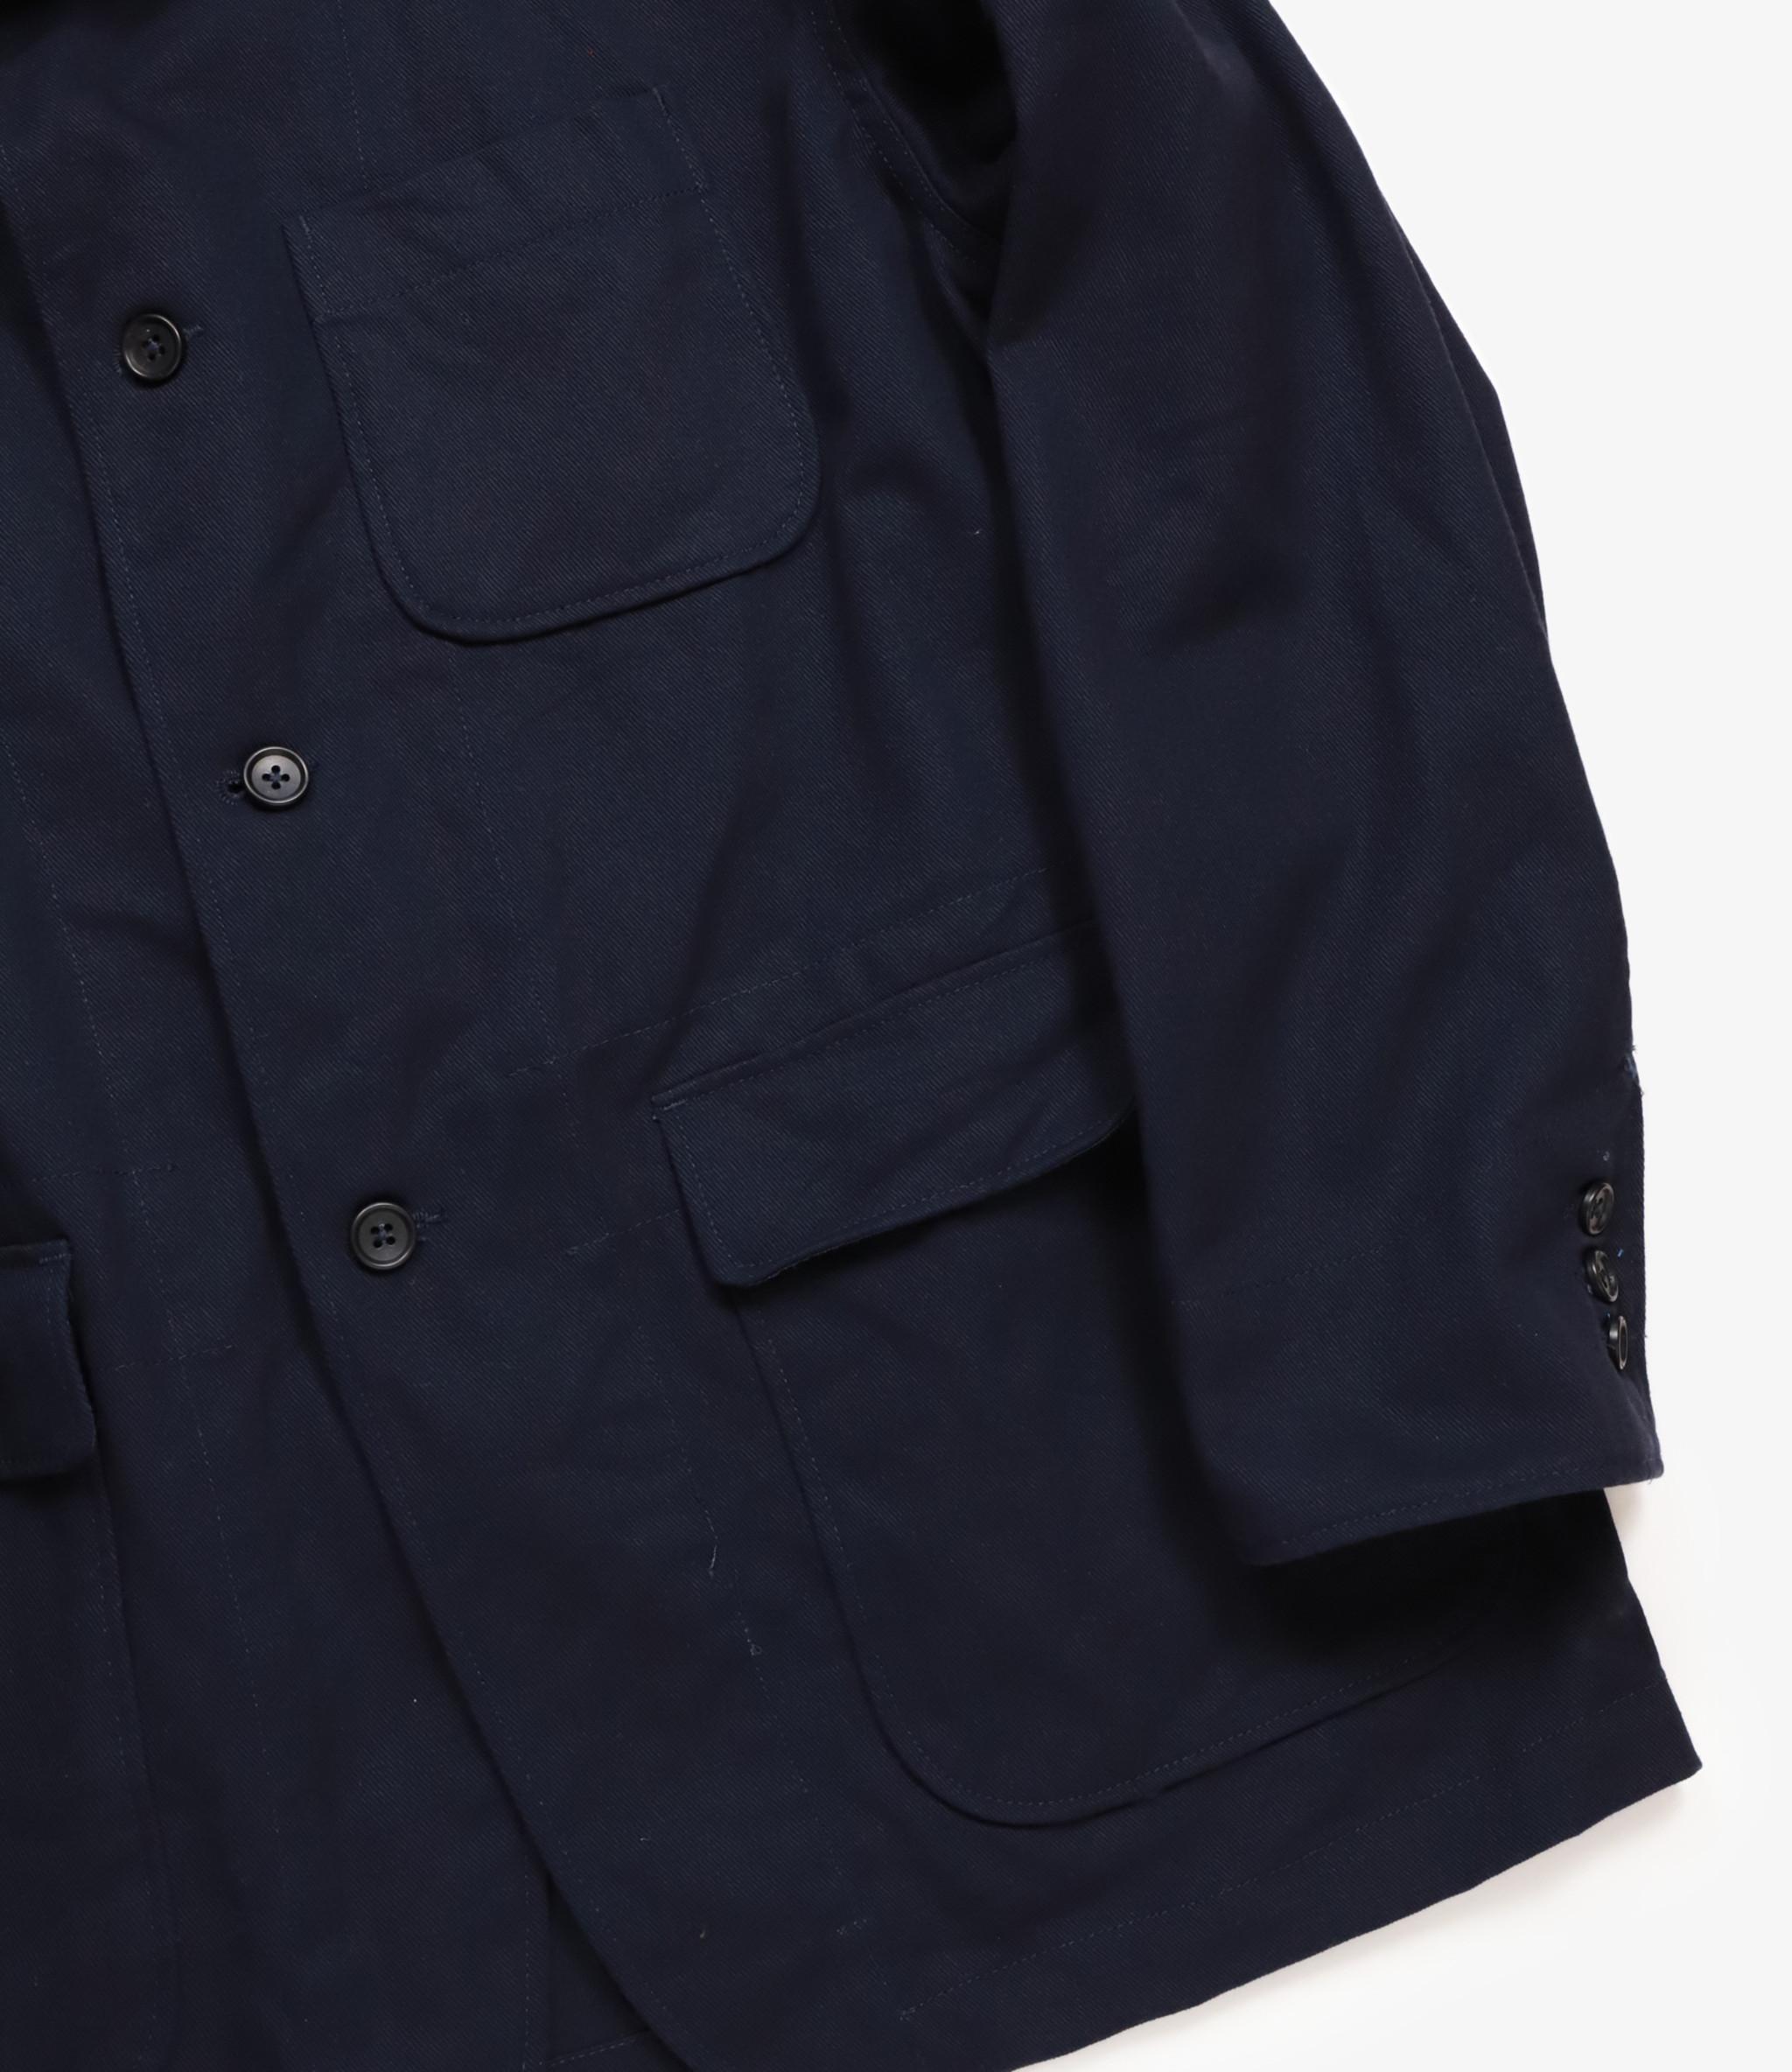 Engineered Garments Loiter Jacket - Dark Navy Cotton Heavy Twill